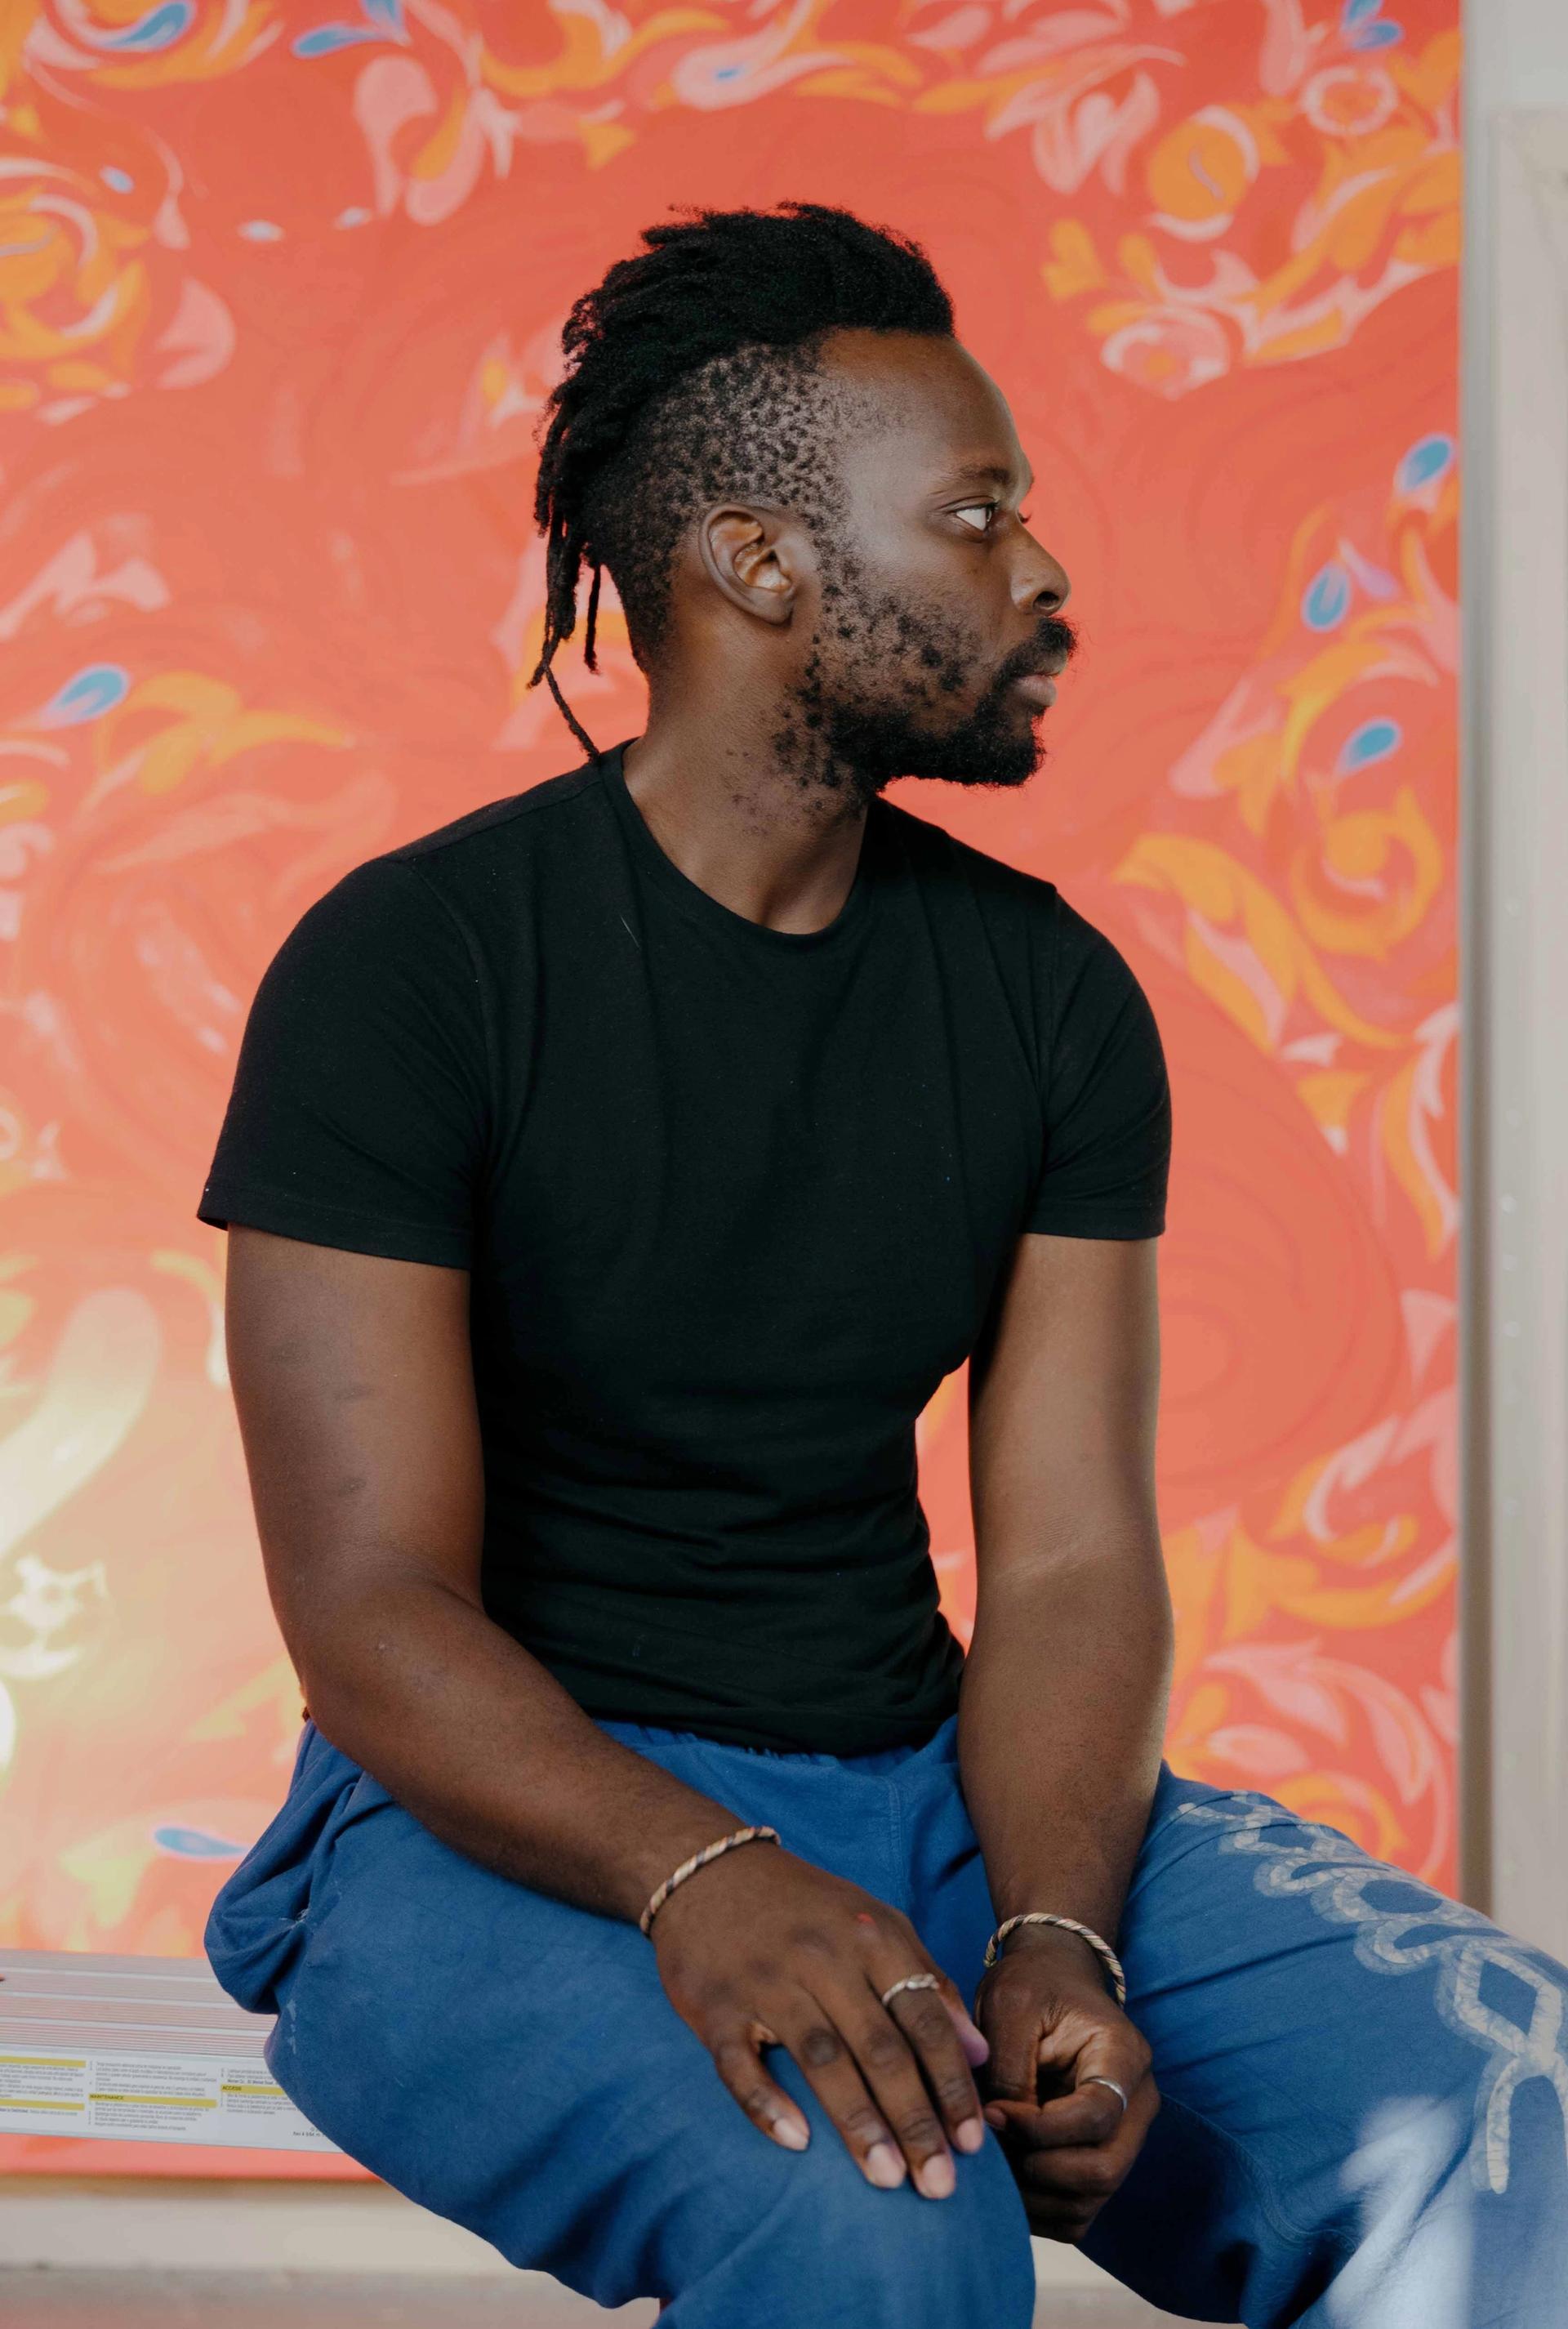 Tunji Adeniyi-Jones Courtesy of White Cube, photo by William Jess Laird